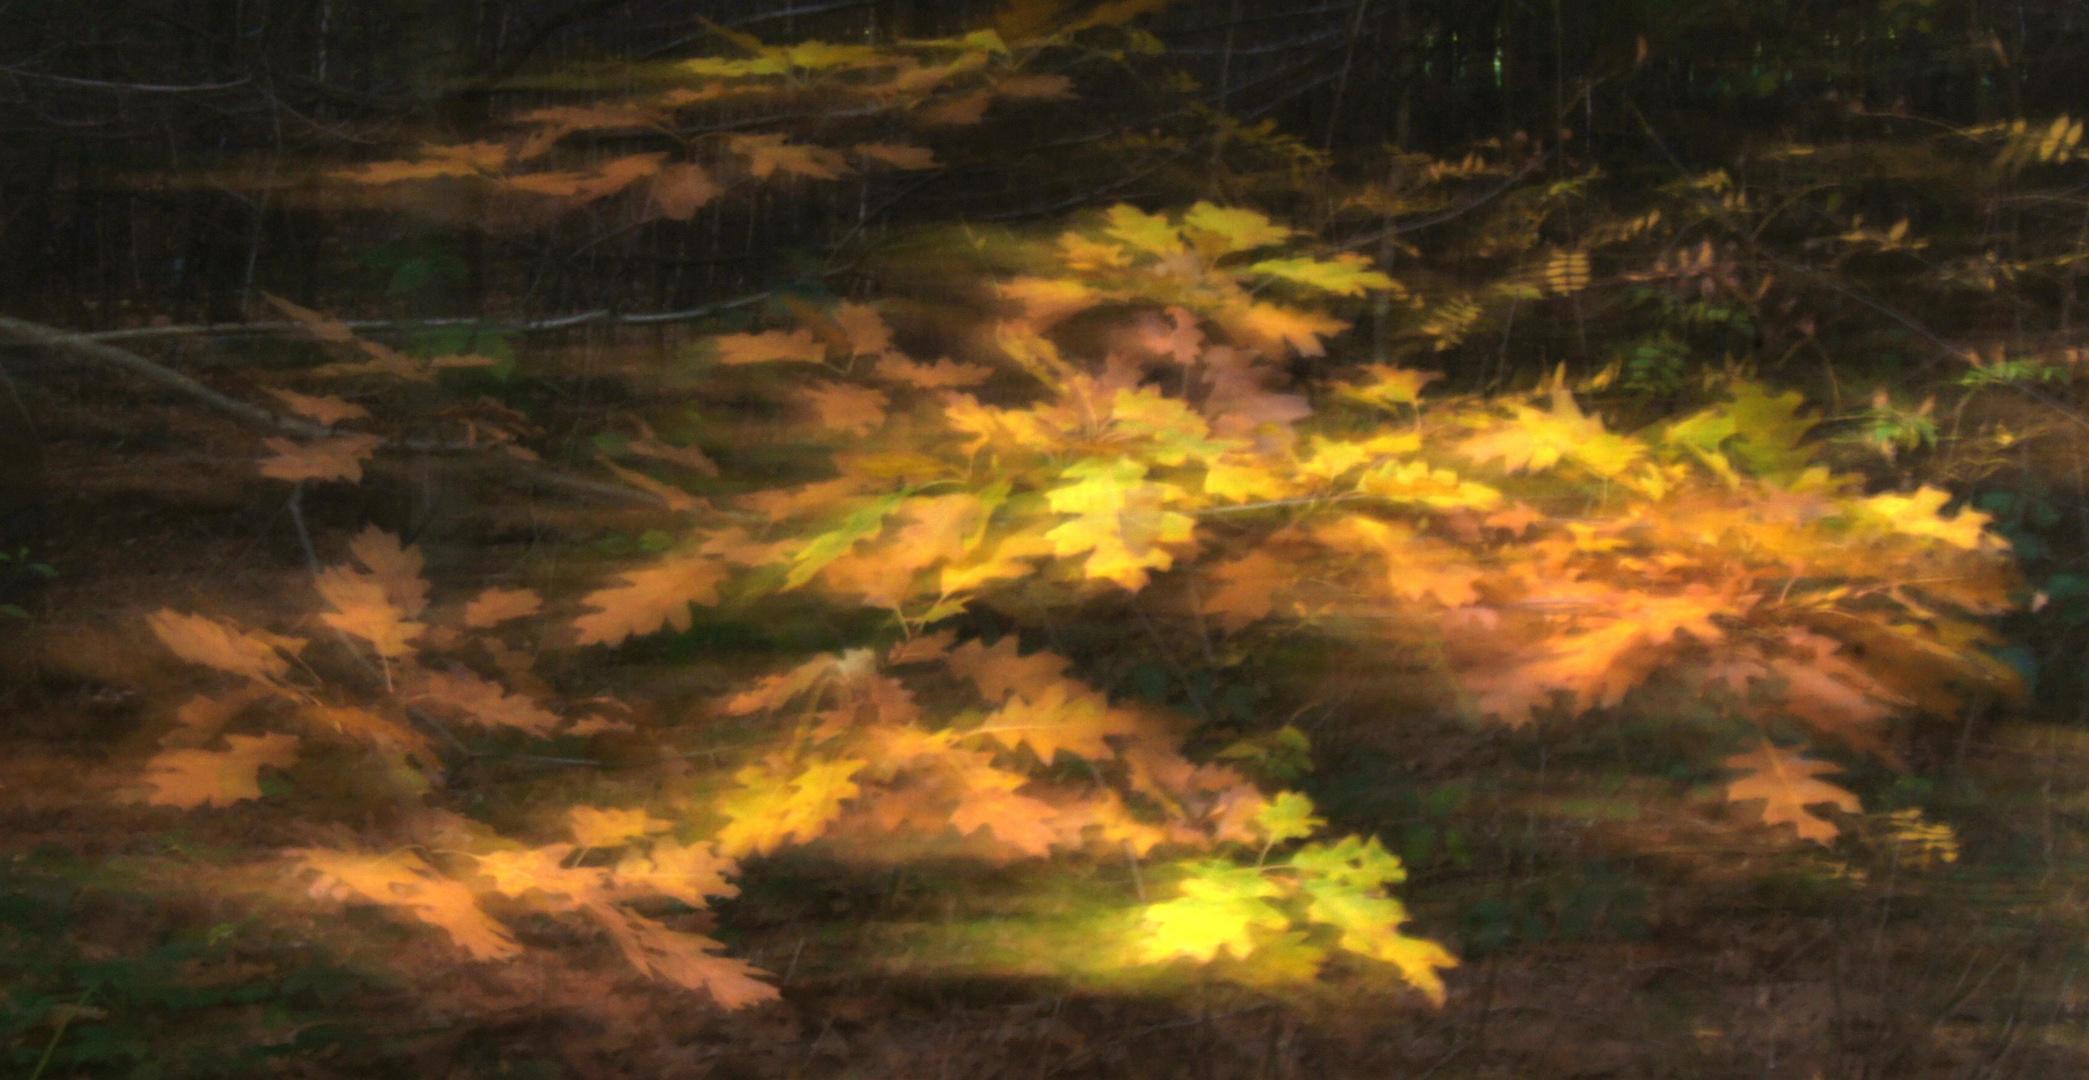 Herbst-Impressionen V